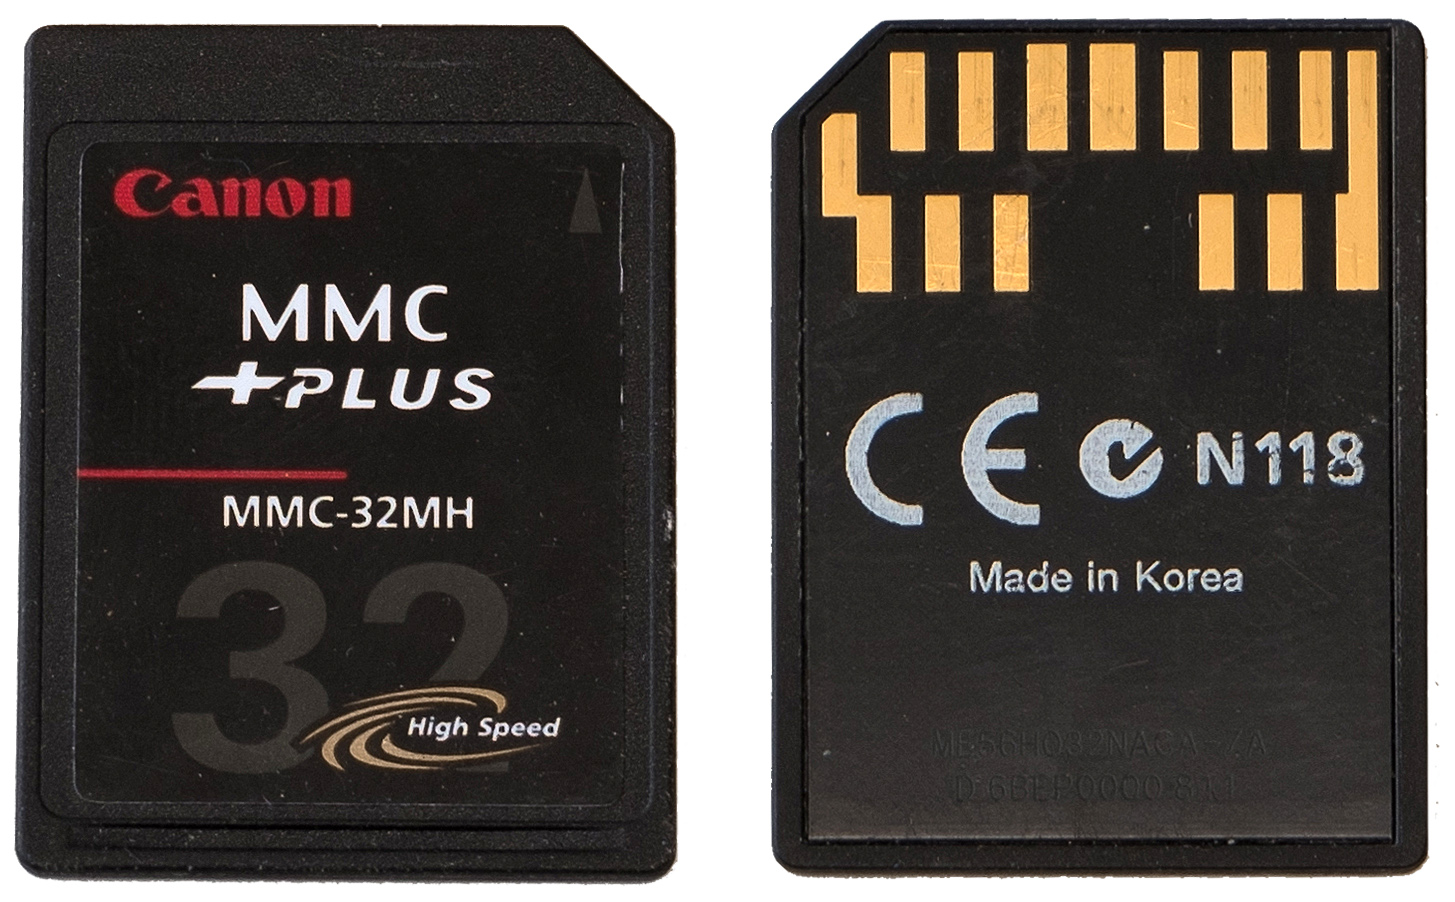 Multimediacard Wikipedia Free Download Nokia N72 Circuit Diagram